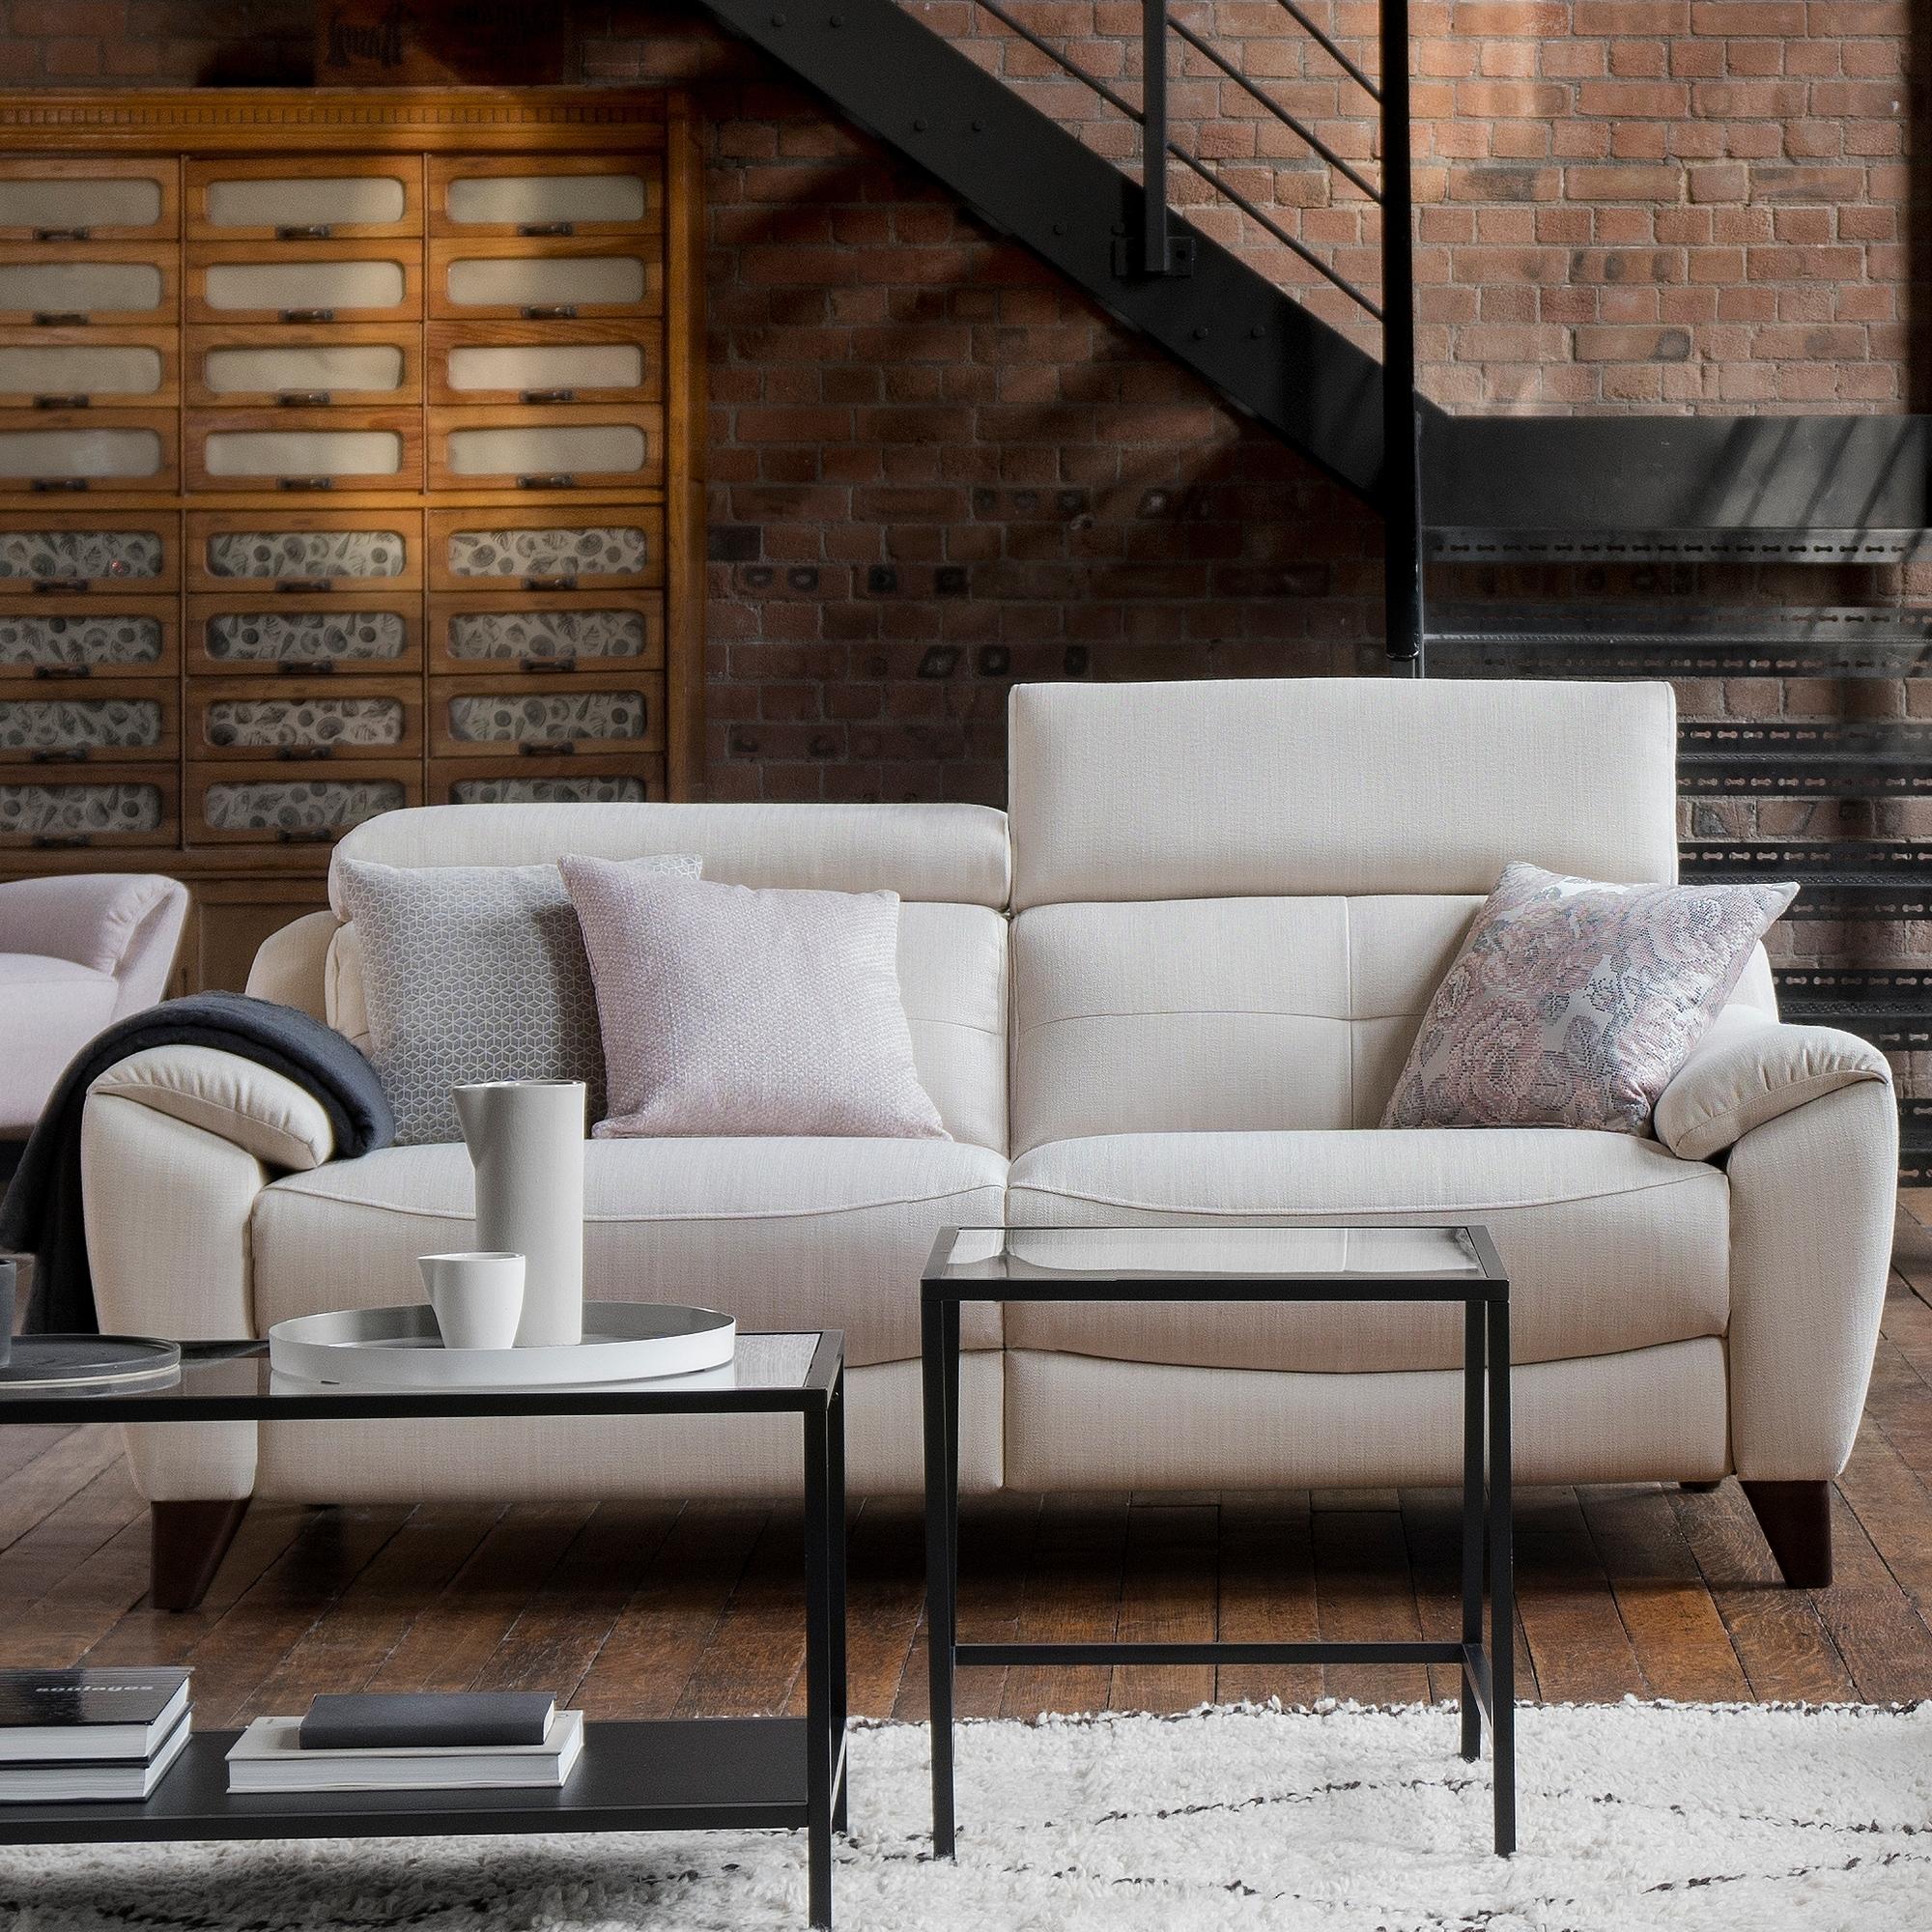 Parker Knoll Evolution Design 1702 2 Seater Sofa Recliner